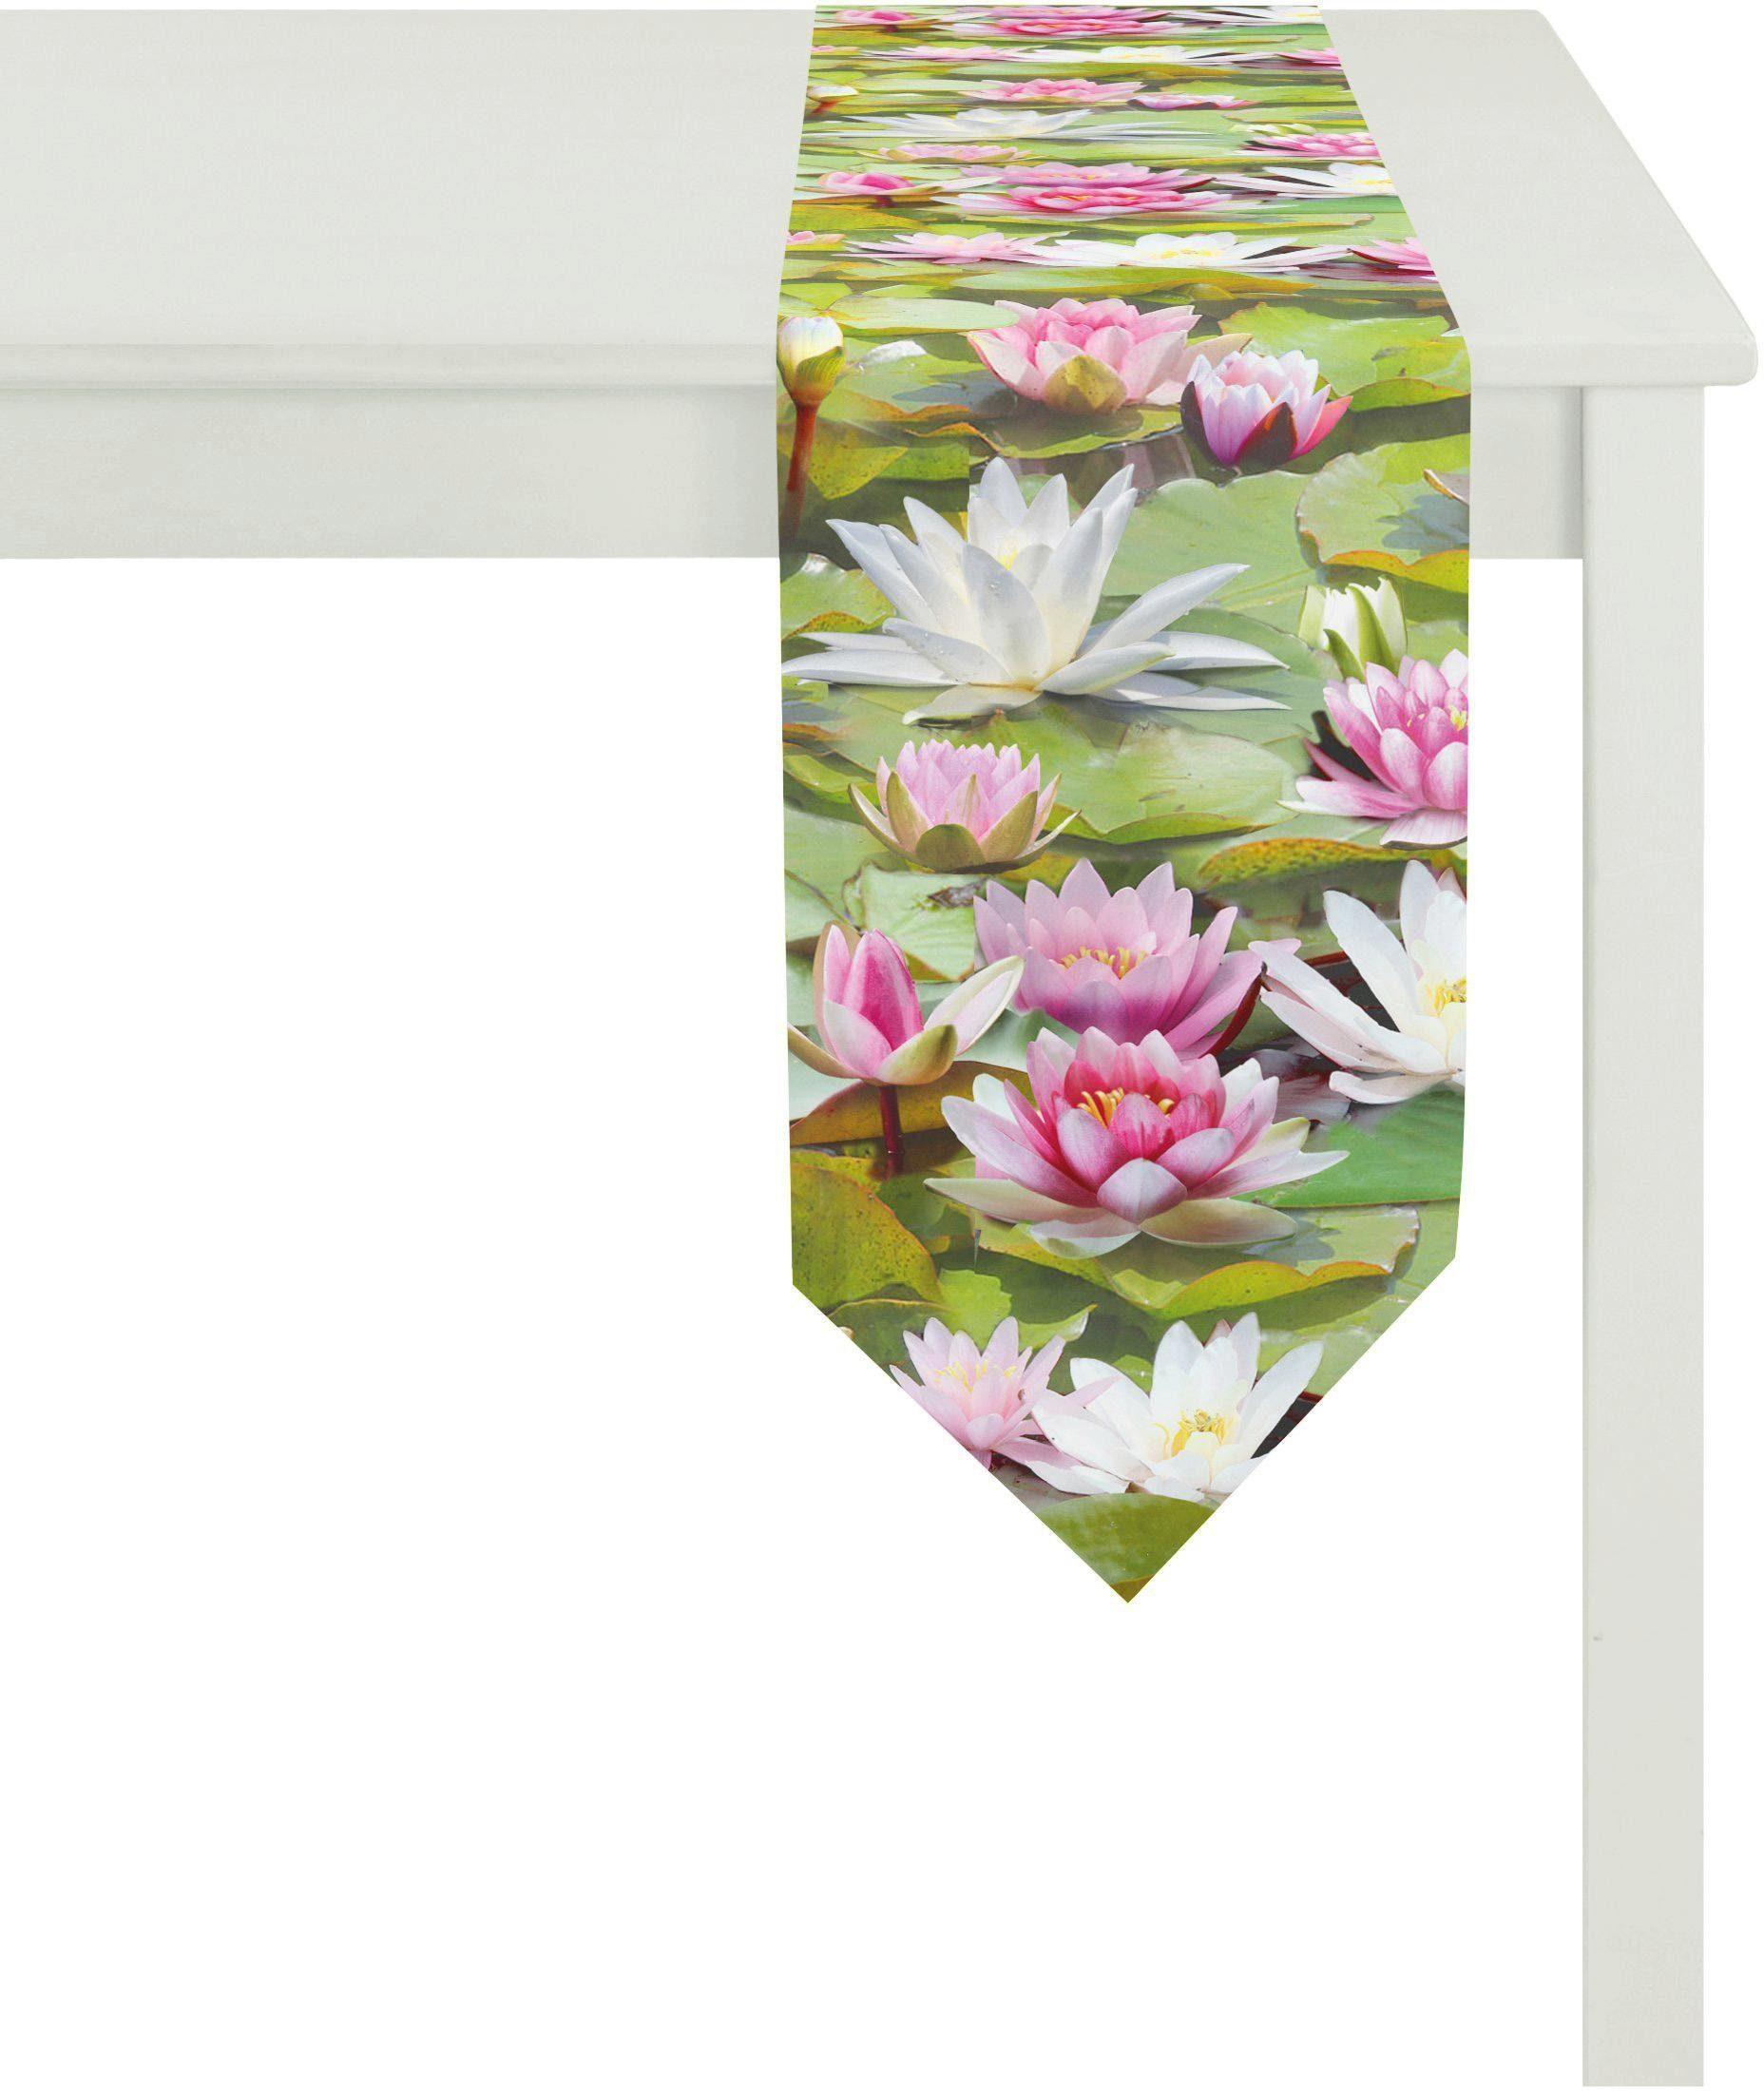 Apelt Tischband, 25x175 cm, »9587 SUMMER GARDEN«